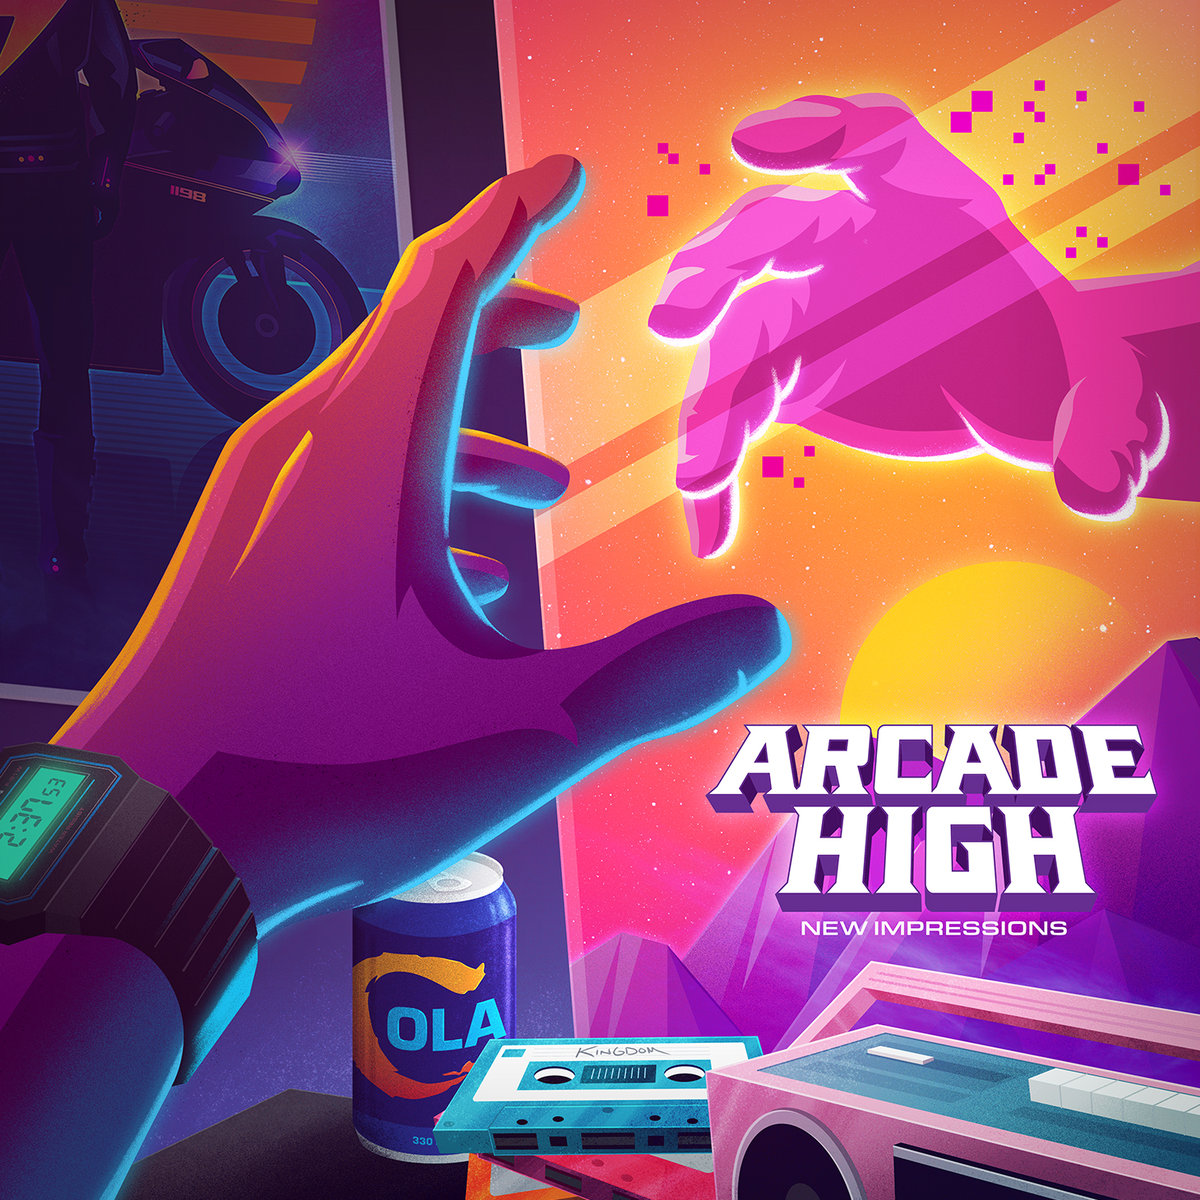 a4242449549 10 - Arcade High - New Impressions